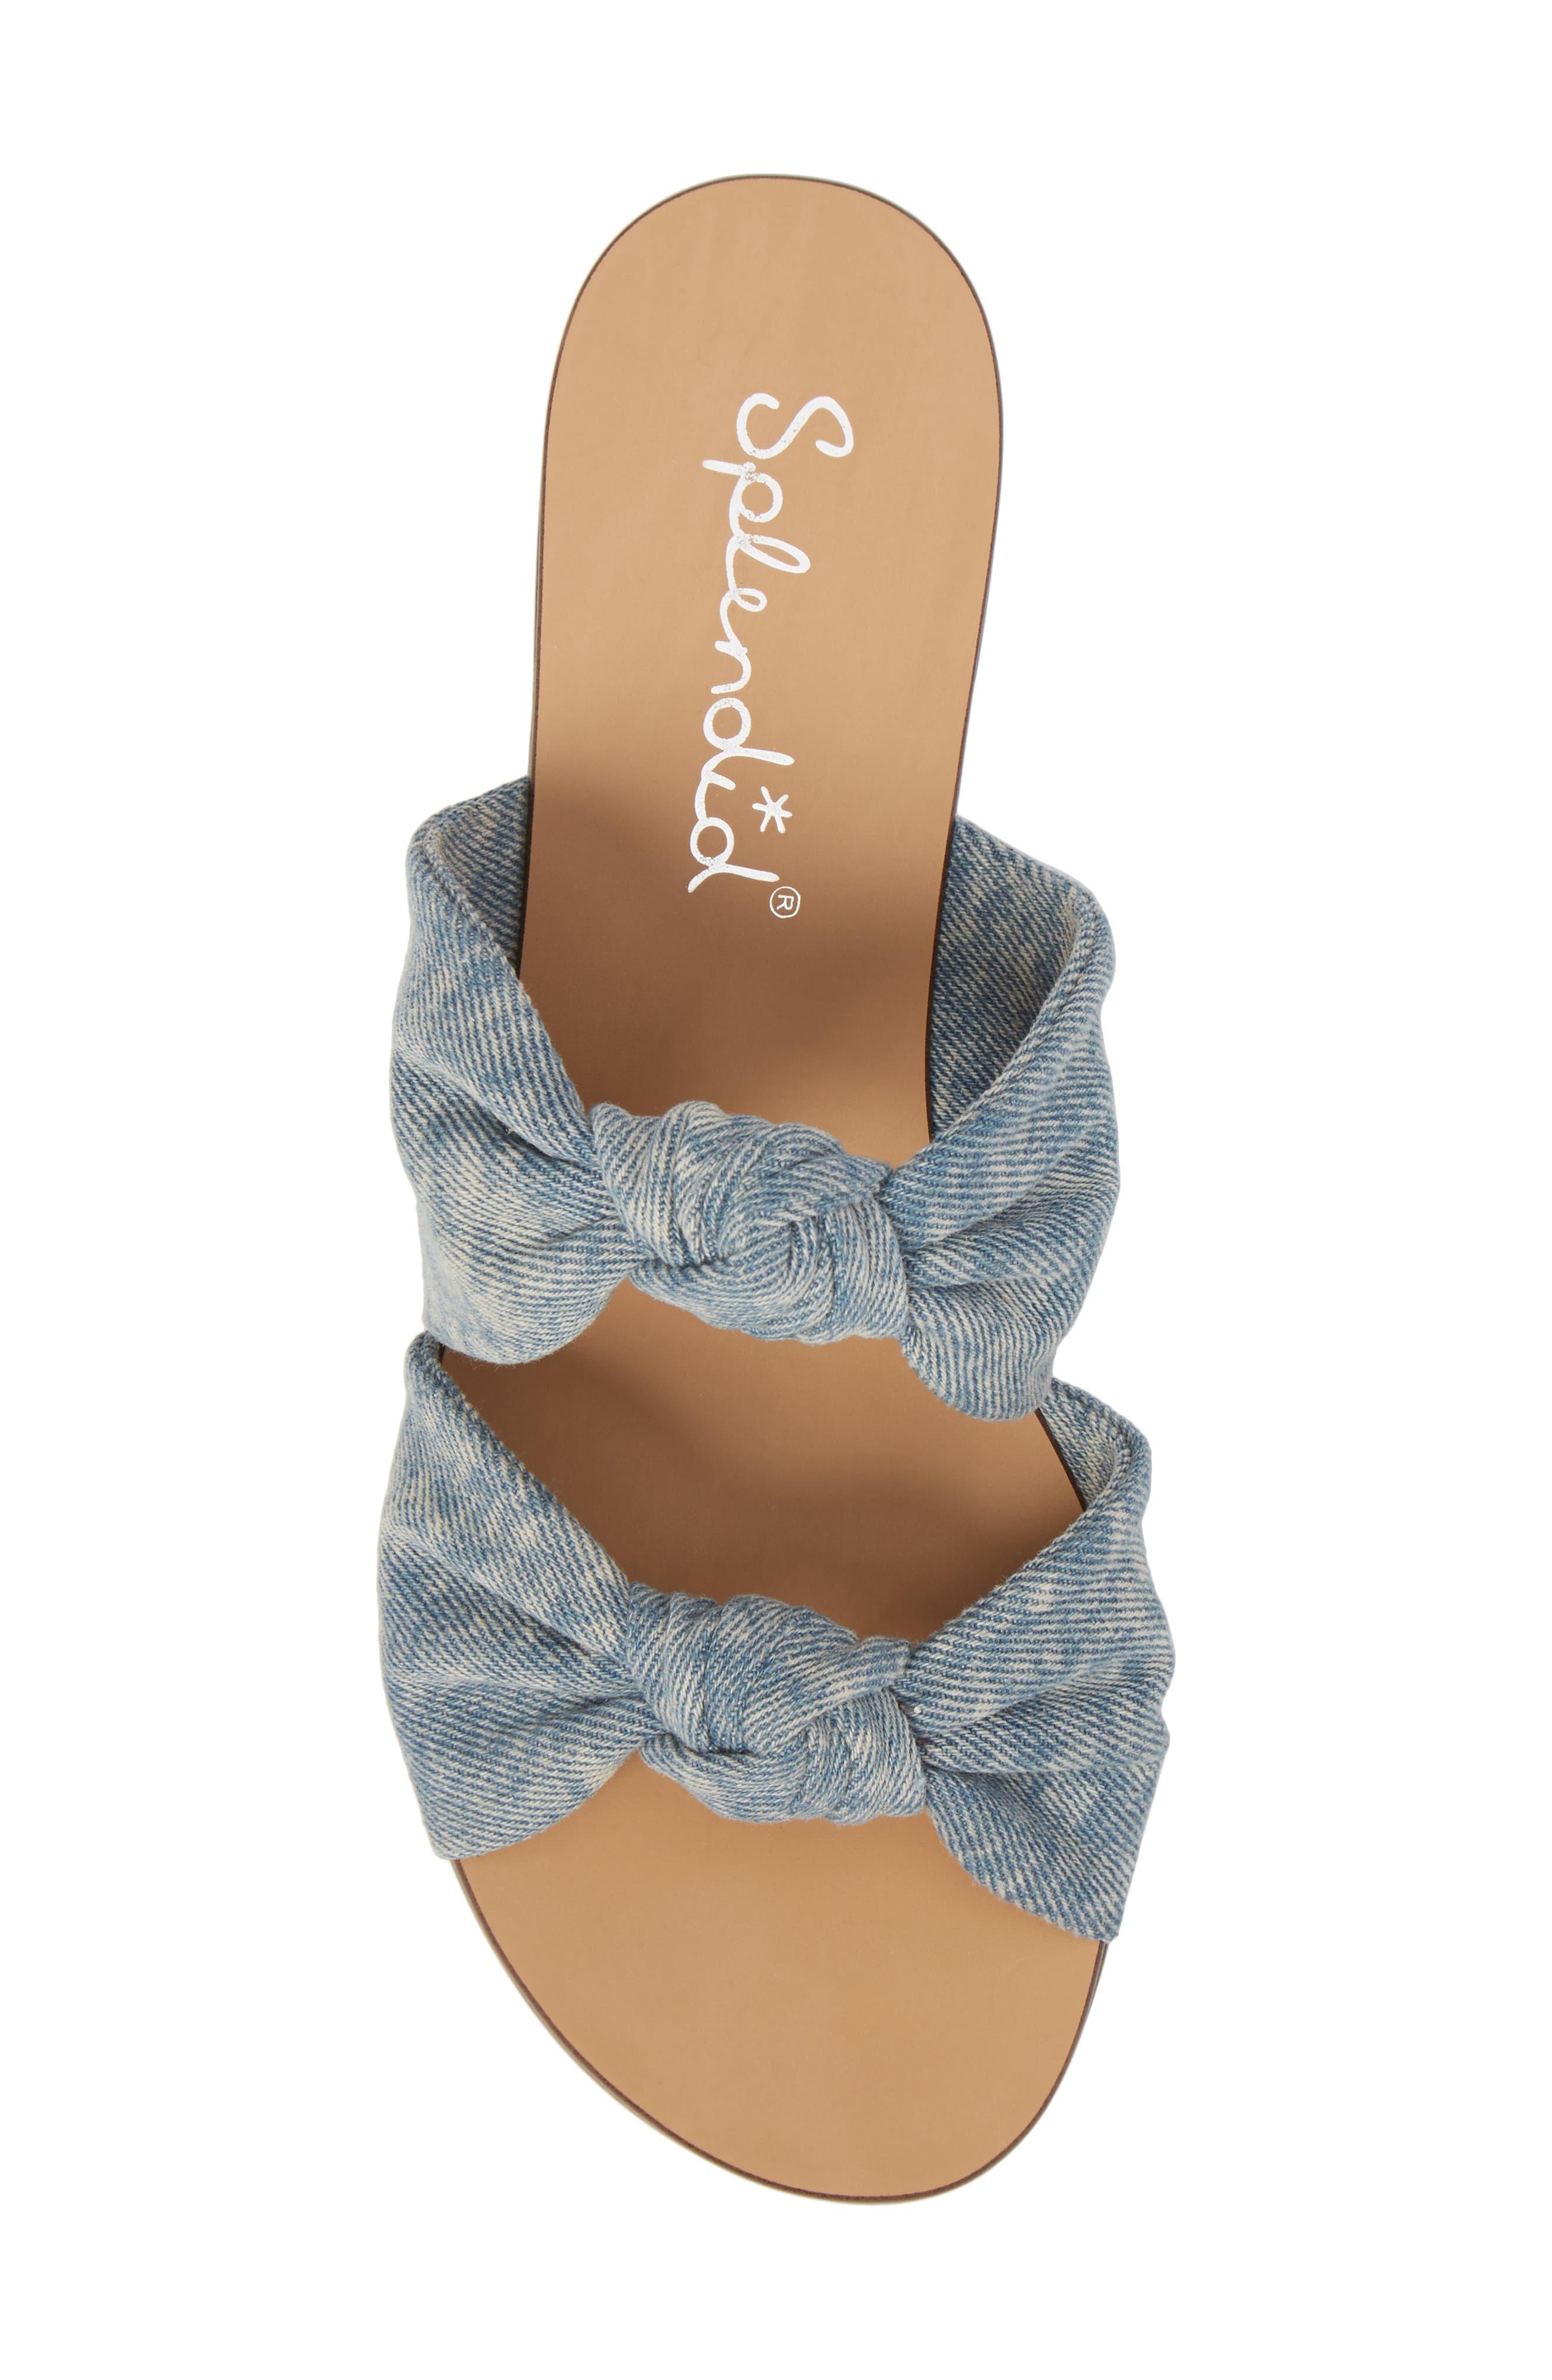 Barton Double Knotted Slide Sandal,                             Alternate thumbnail 5, color,                             Jean Fabric